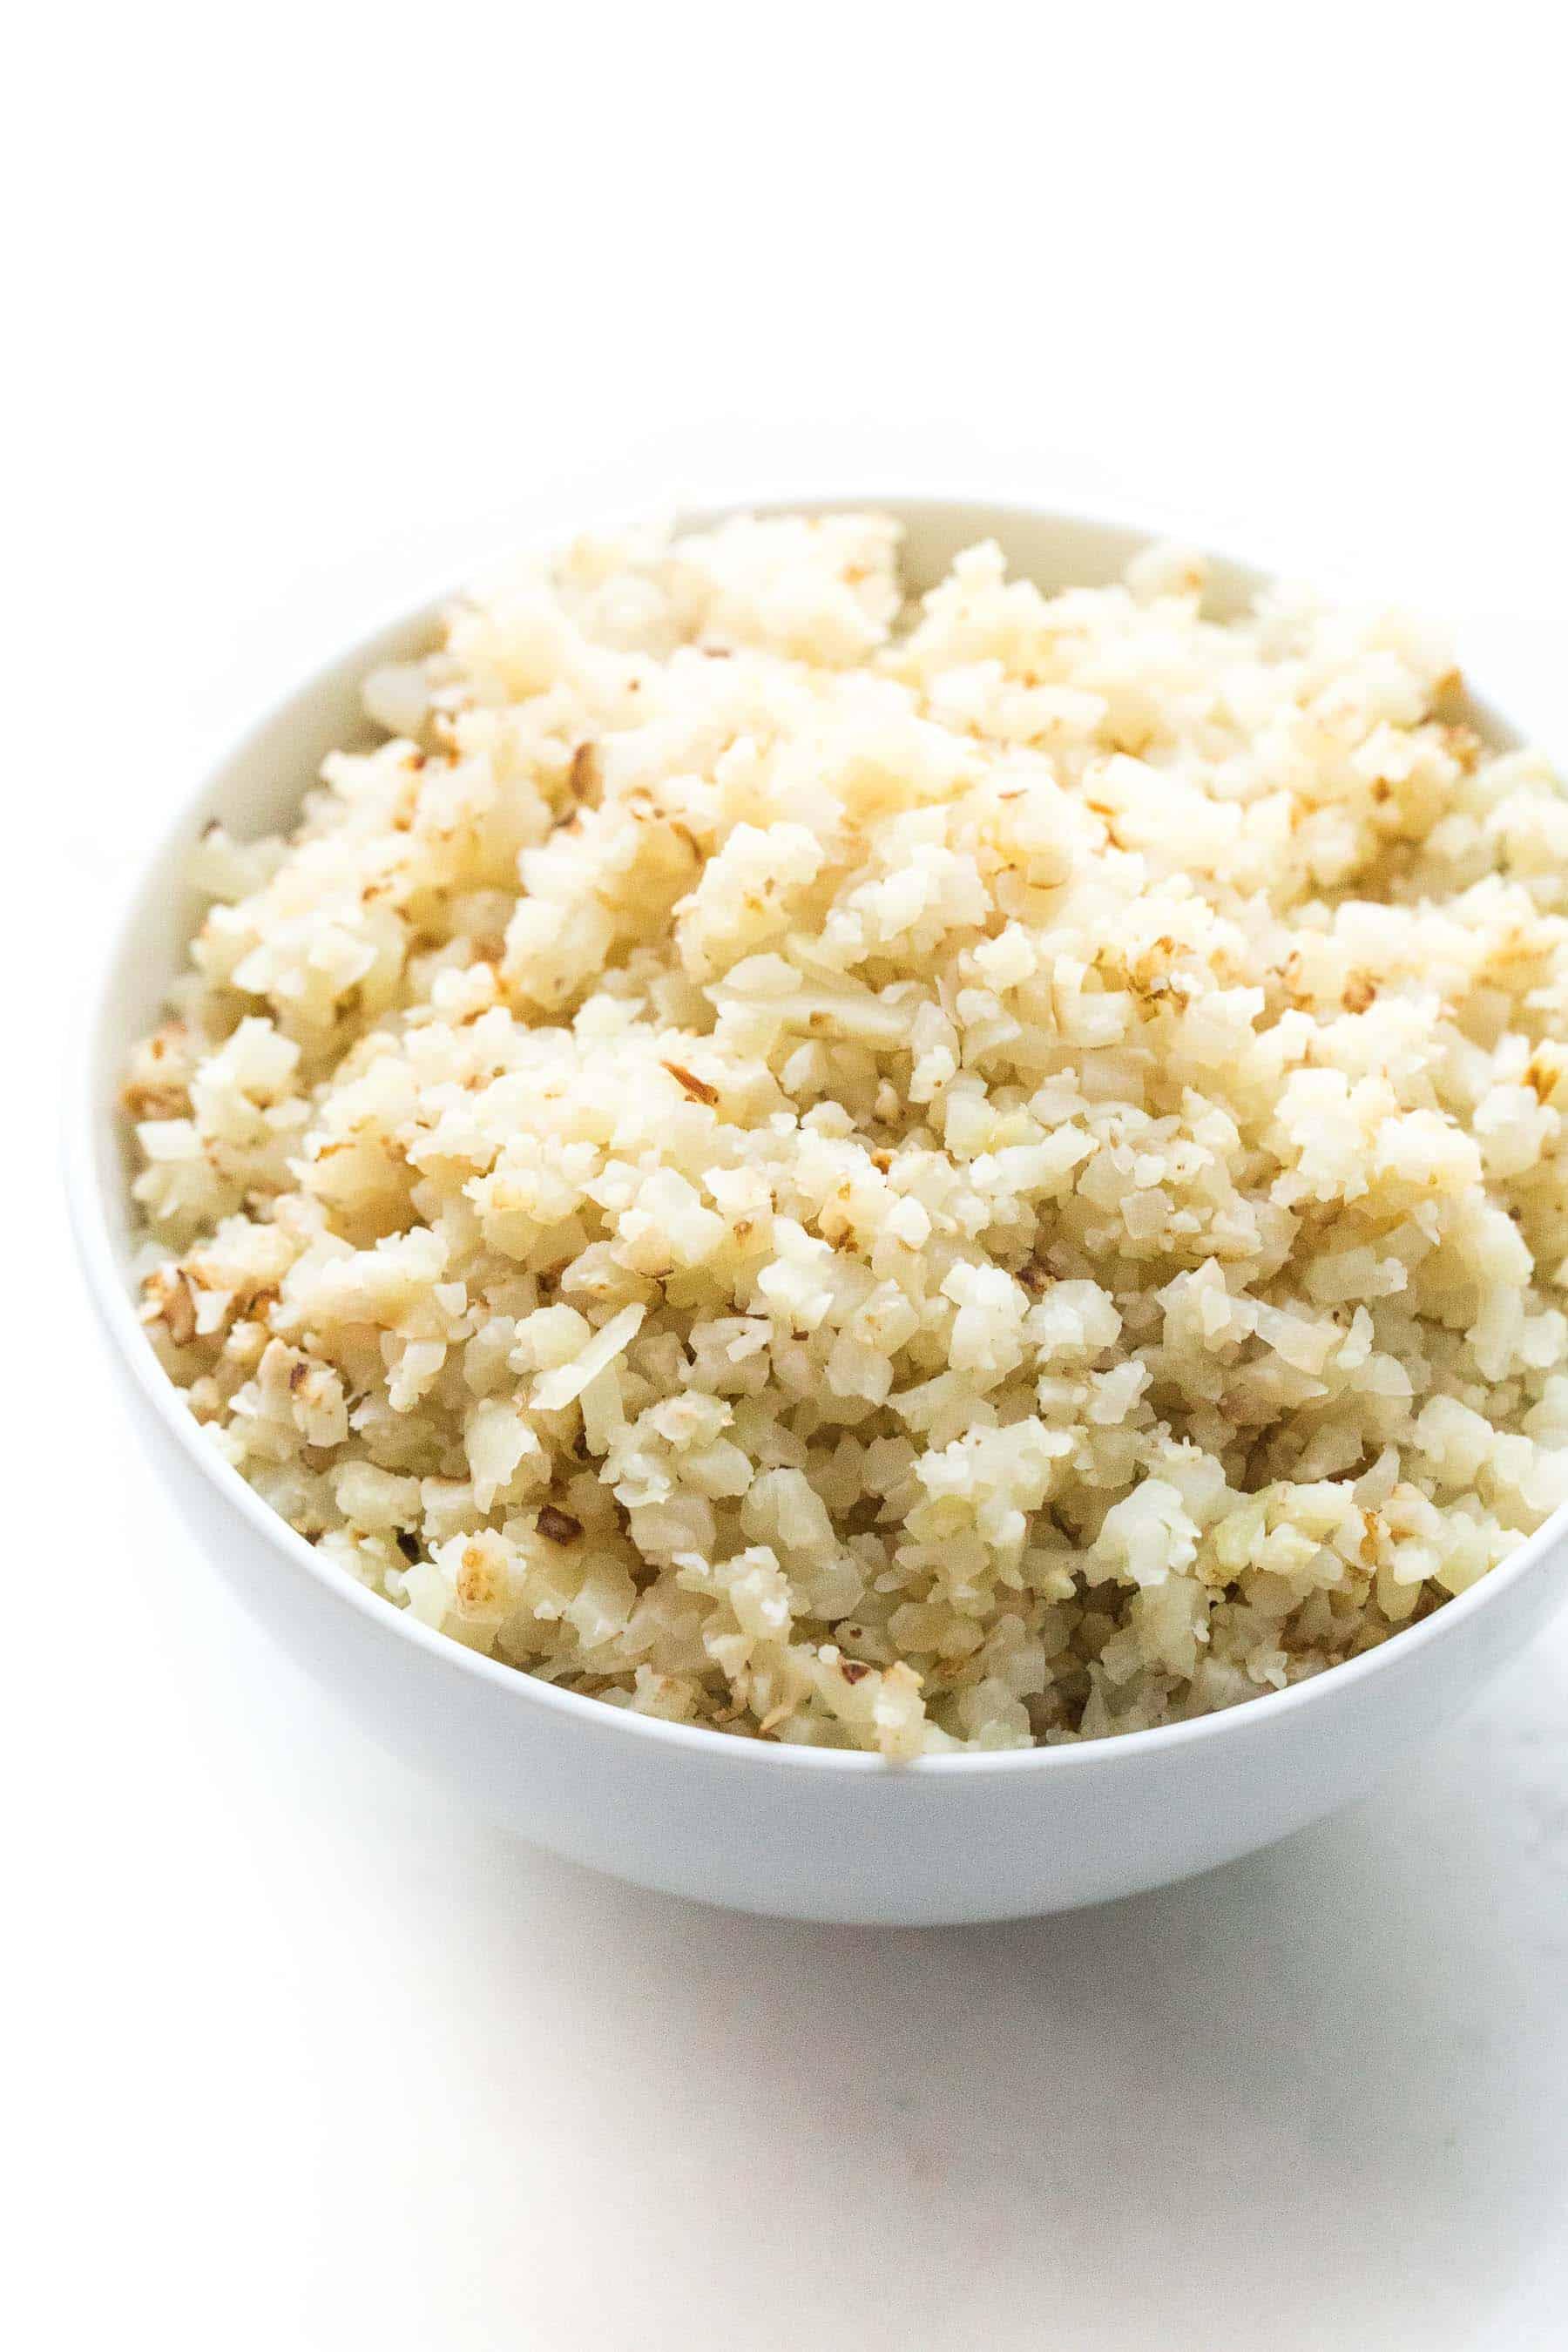 cauliflower rice hack tastes lovely